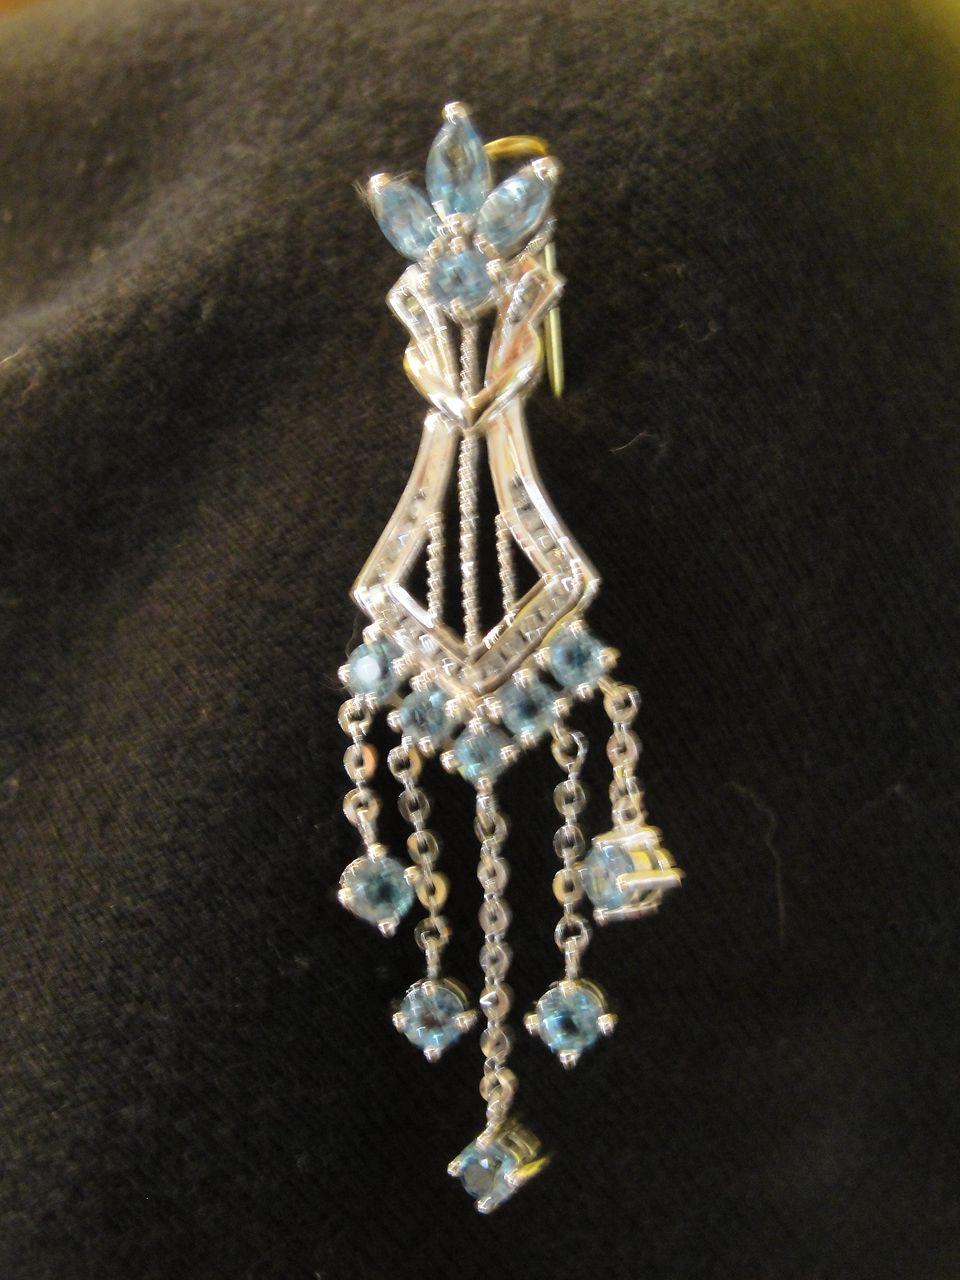 Brilliant Blue Topaz with diamond Accent 10K White Gold Pendant - Free Shipping